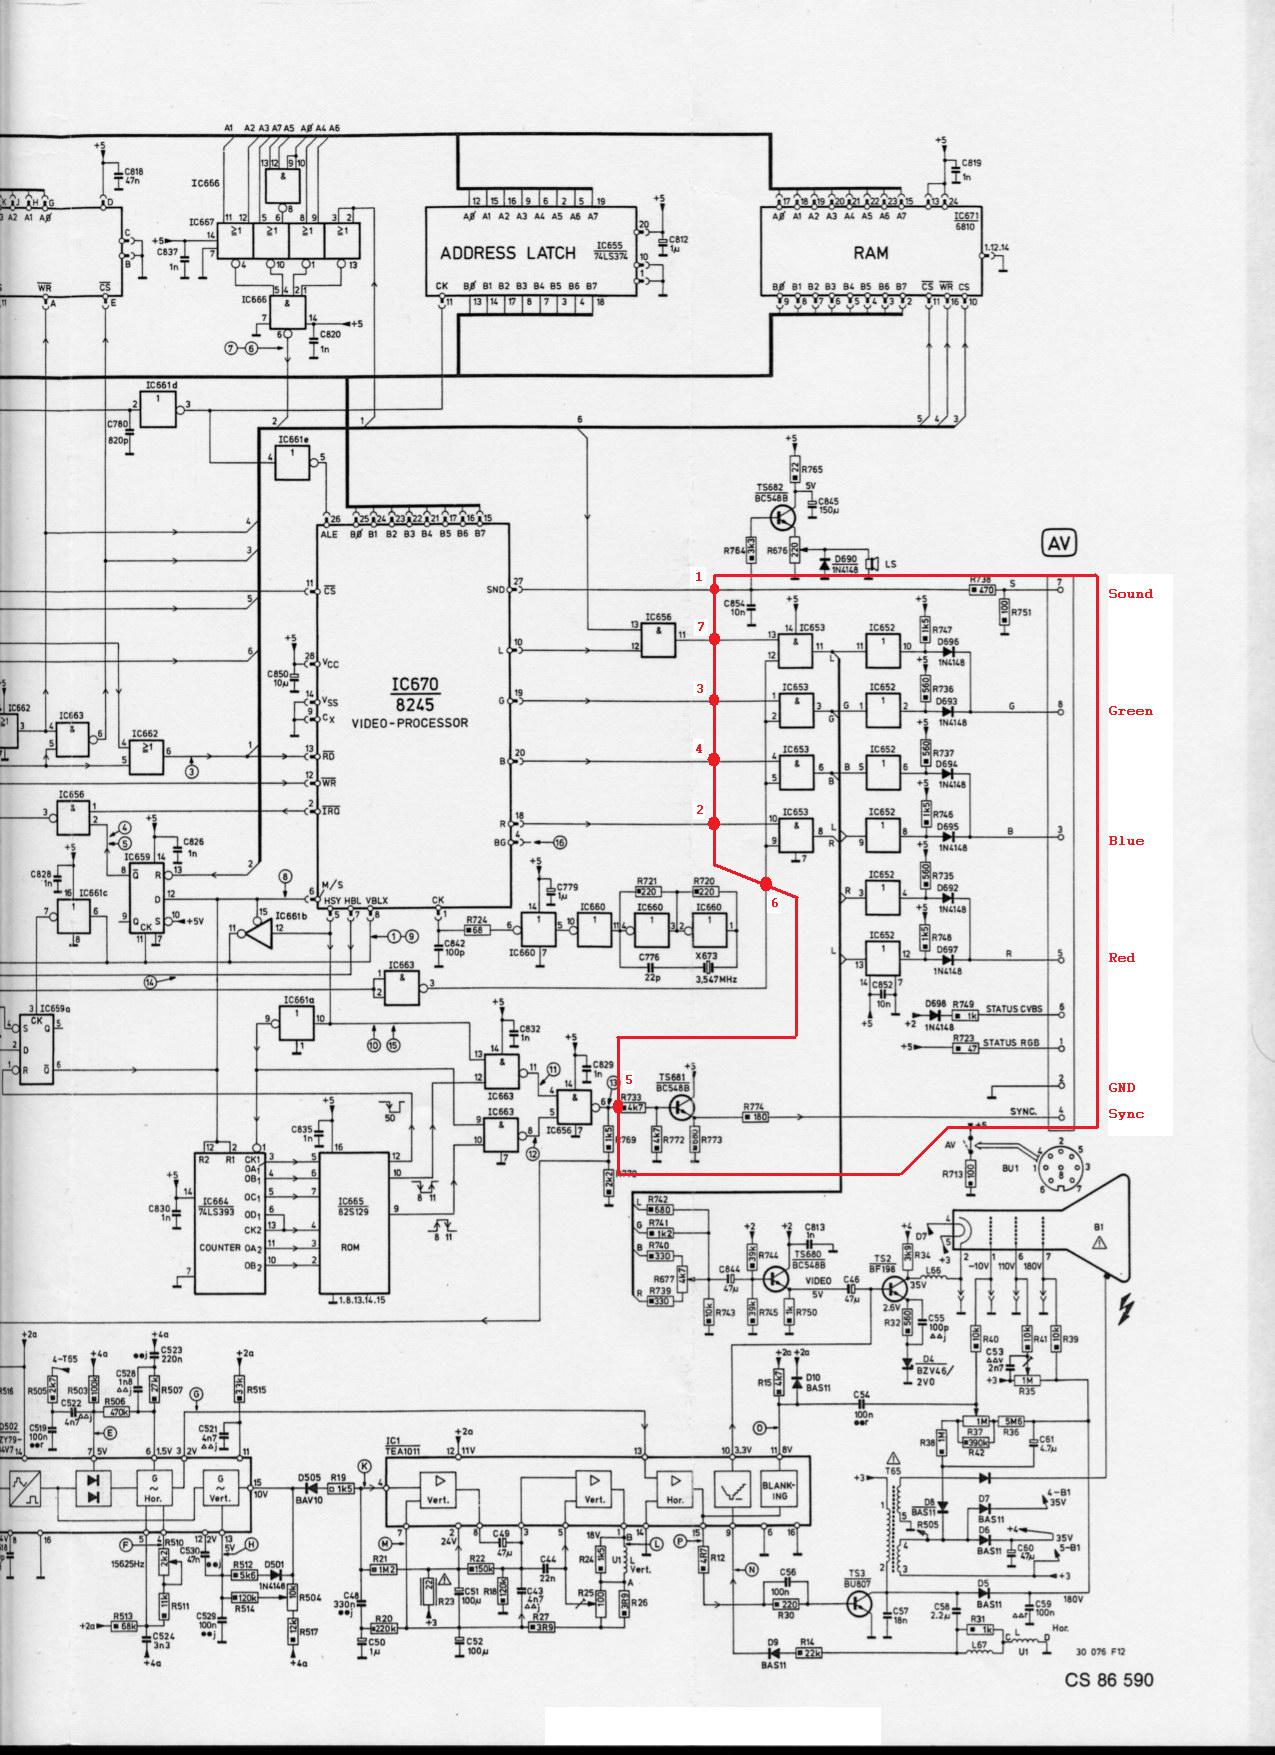 O2 RGB mod - Odyssey 2 / Videopac - AtariAge Forums Magnavox Odyssey Schematic on